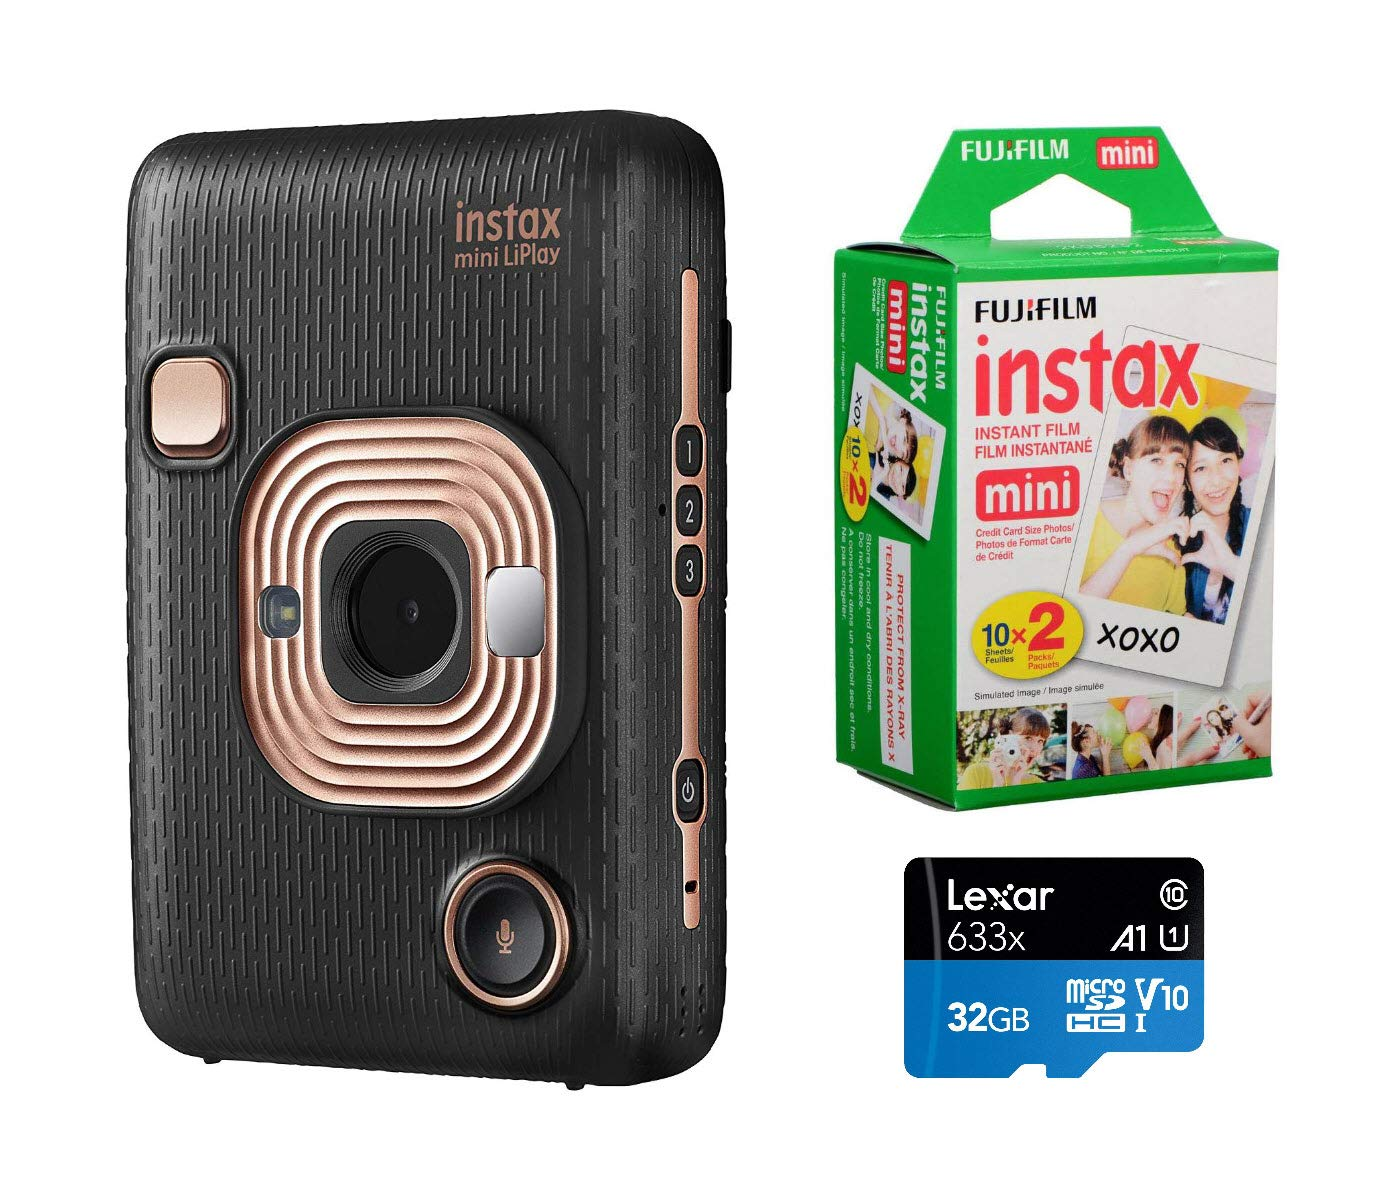 Fujifilm Instax Mini Liplay Hybrid Instant Camera (Elegant Black), Bundle Instax Mini Instant Daylight Film, Twin Pack (20 Exposures), 32GB MicroSD Card by Fujifilm